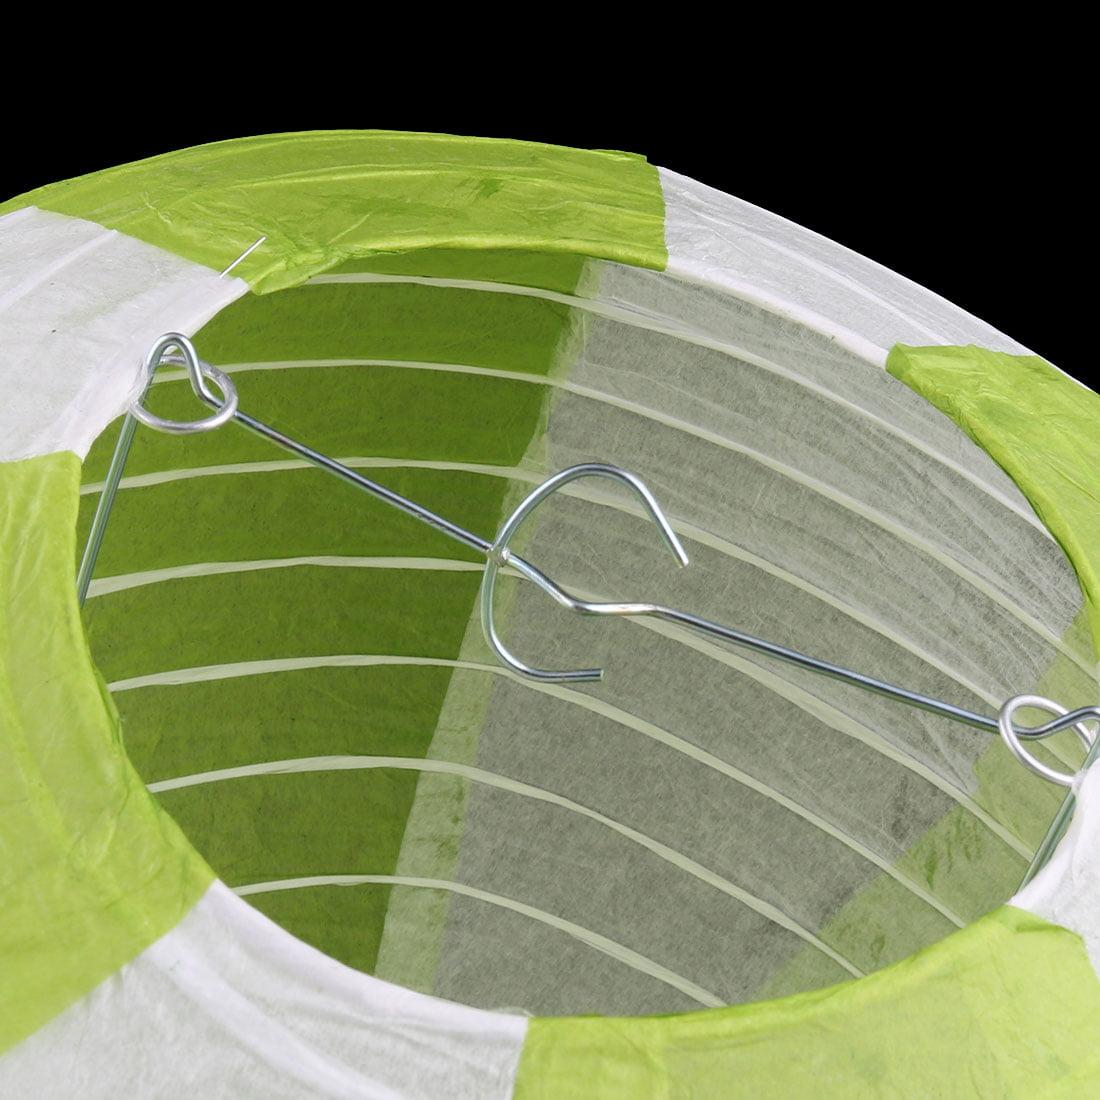 Festival Party Paper DIY Handmade Lightless Hot Air Balloon Lantern Green White - image 5 of 6